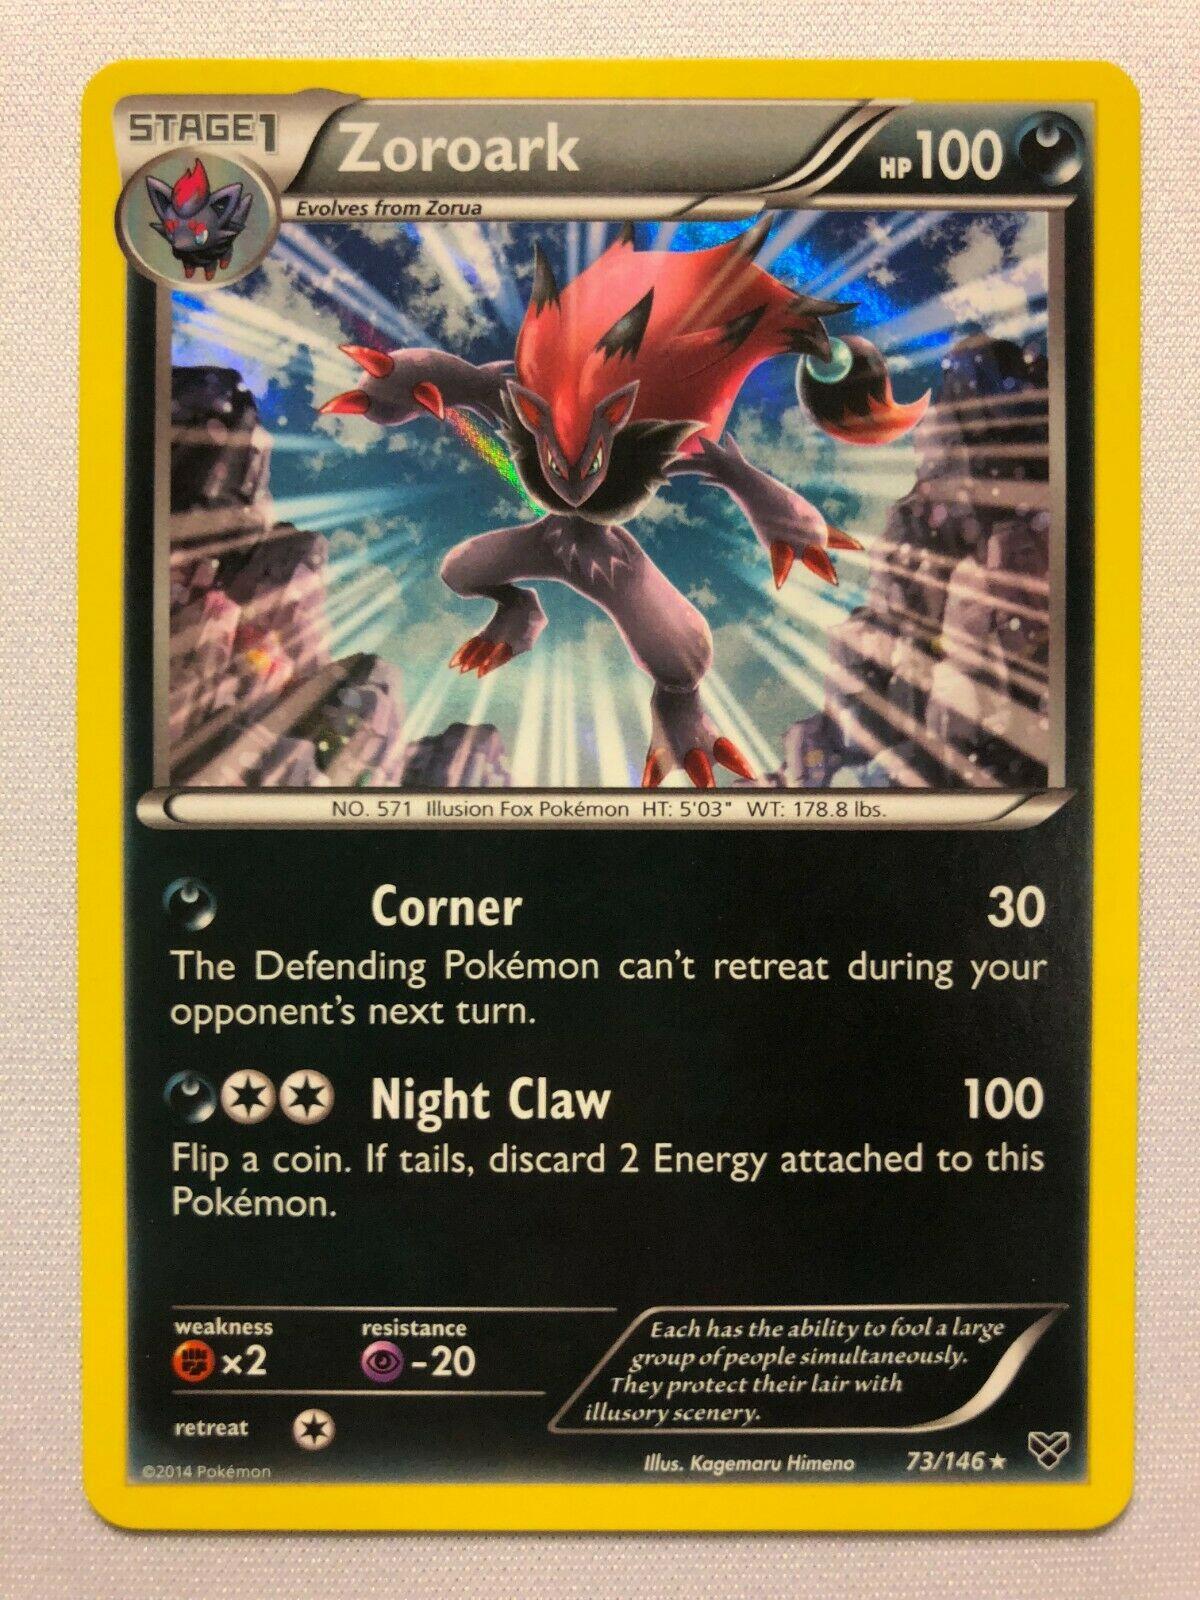 - NM//Mint 3 x Pokemon Card ZOROARK XY 73//146 holo-foil